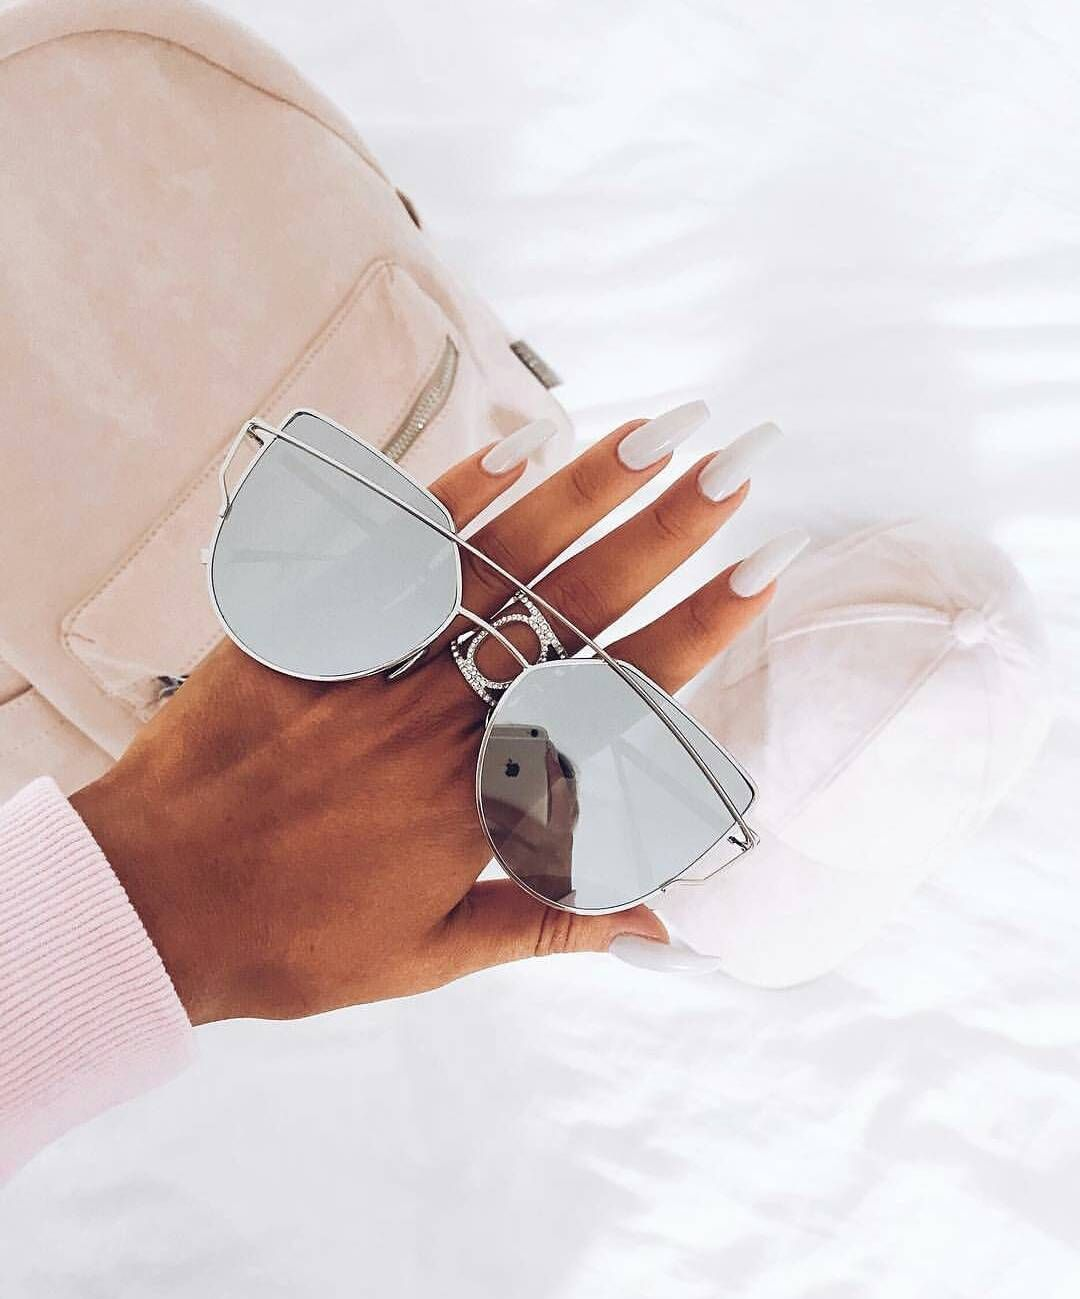 8d0b9c655488 Cat Eye Sunglasses, Mirrored Sunglasses, Nail Inspo, Sunnies, Cuff  Bracelets, Shades